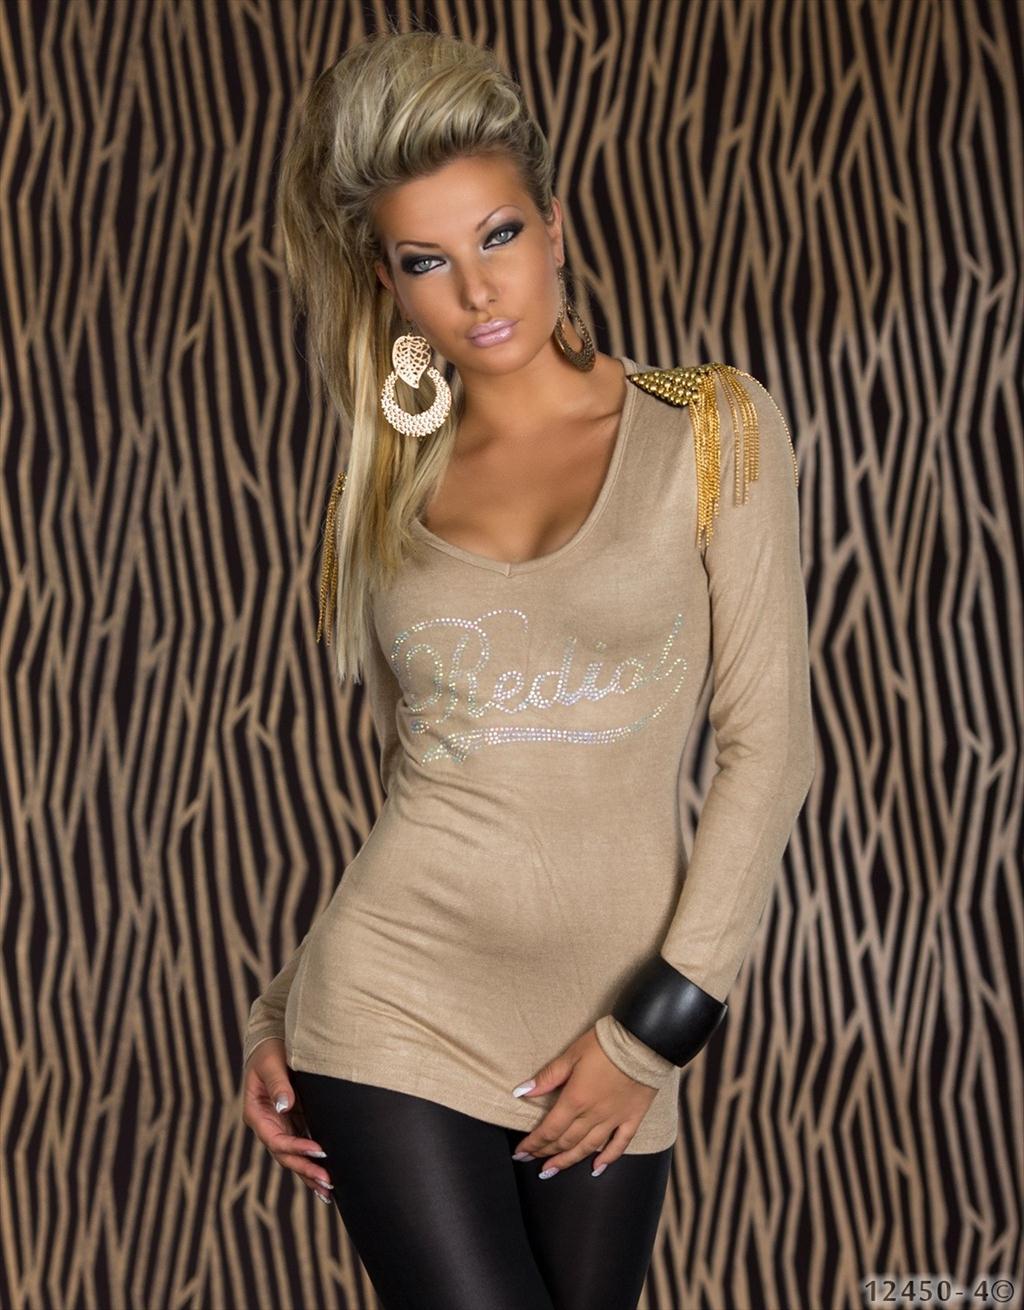 49c43adbb805 Fashion Queen - Dámske oblečenie a móda - Sveter REDIAL